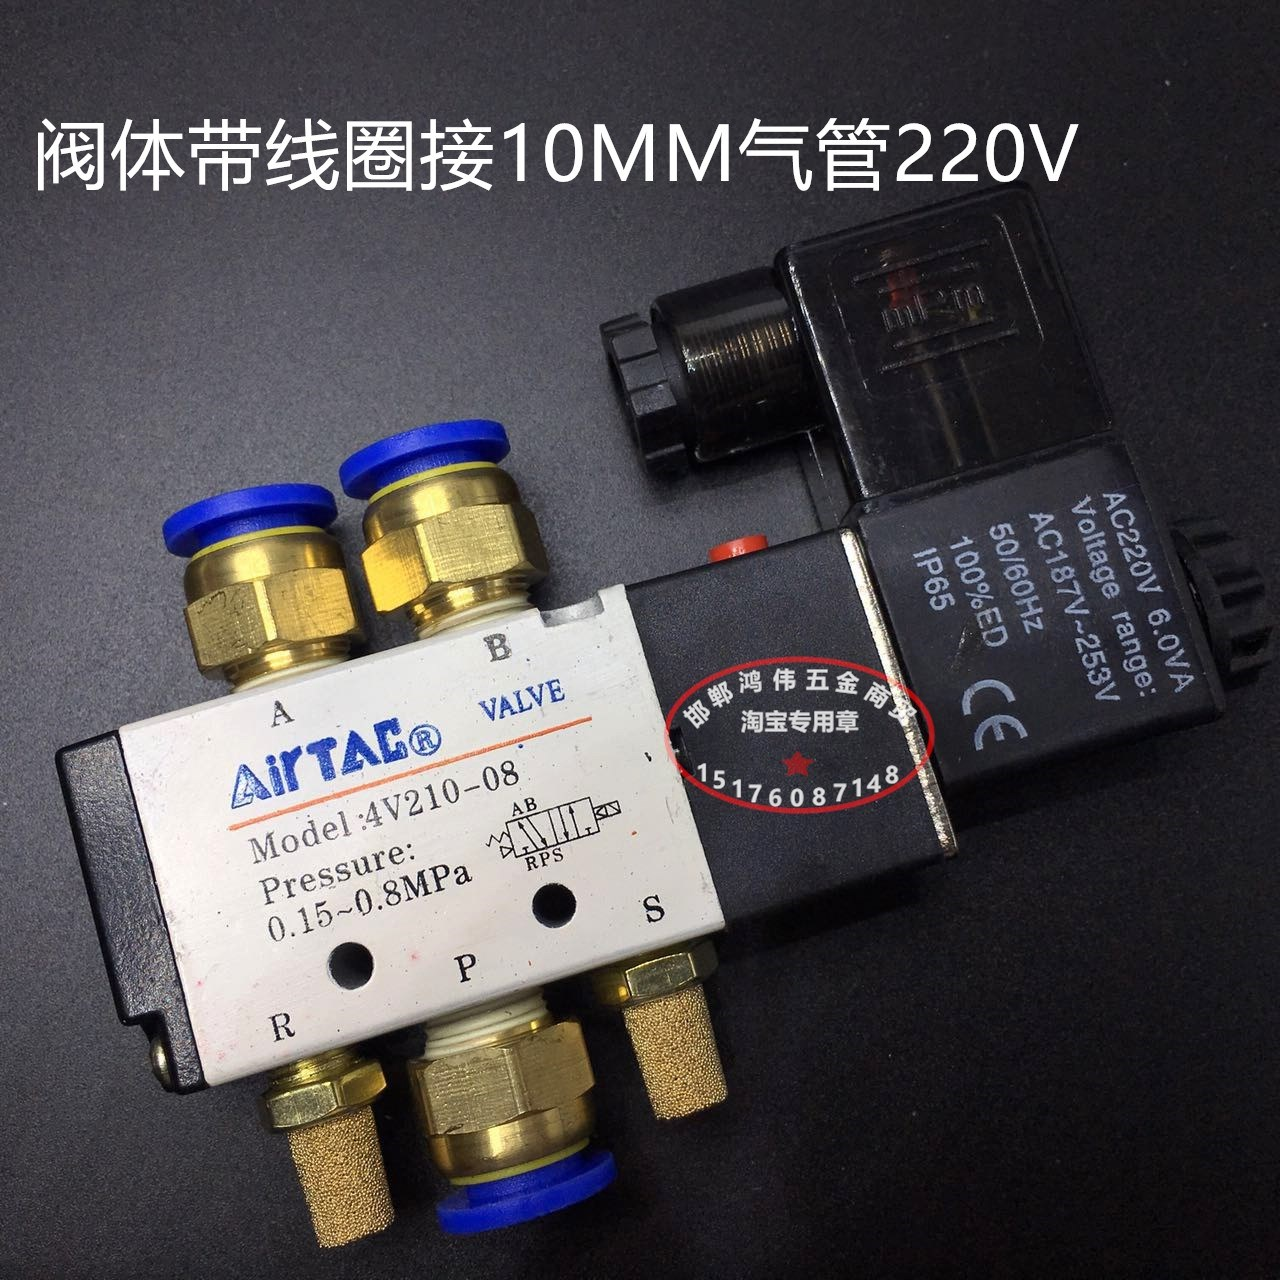 Air pump muffler, solenoid valve, water valve switch, valve reversing control valve joint, trachea quick pneumatic component